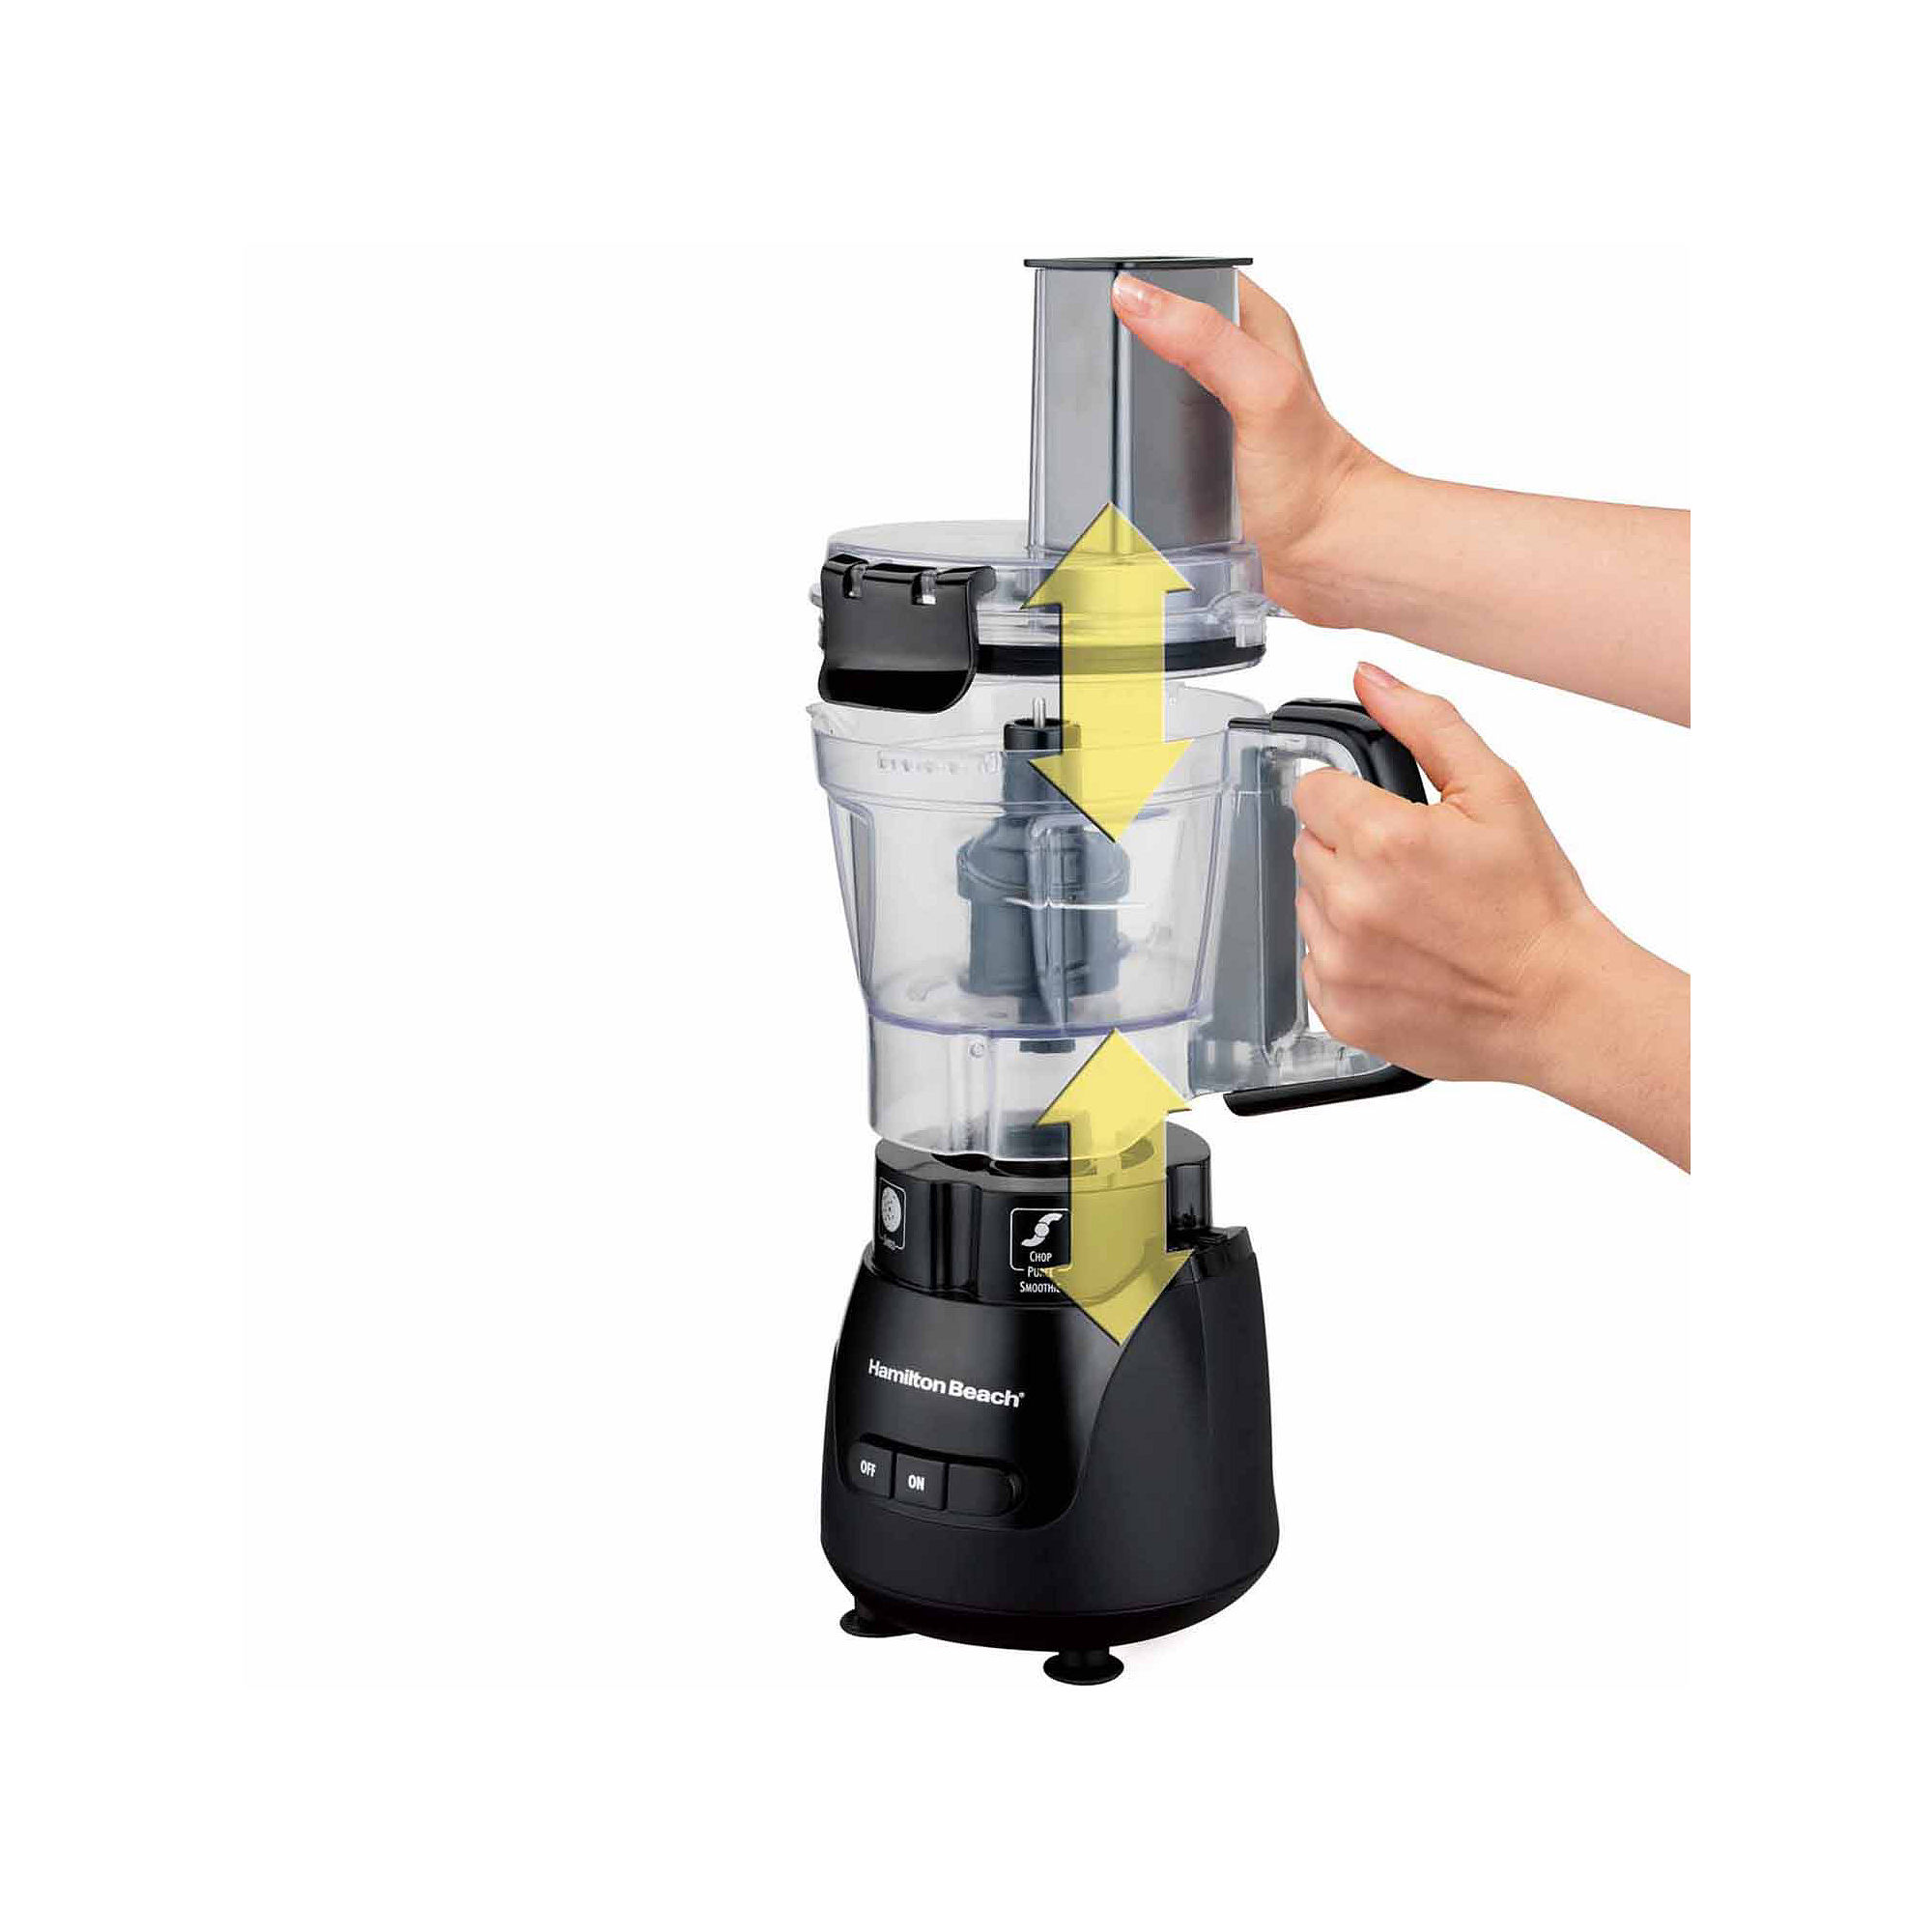 "Hamilton Beach Stack & Snap"" 4-Cup Compact Food Processor"